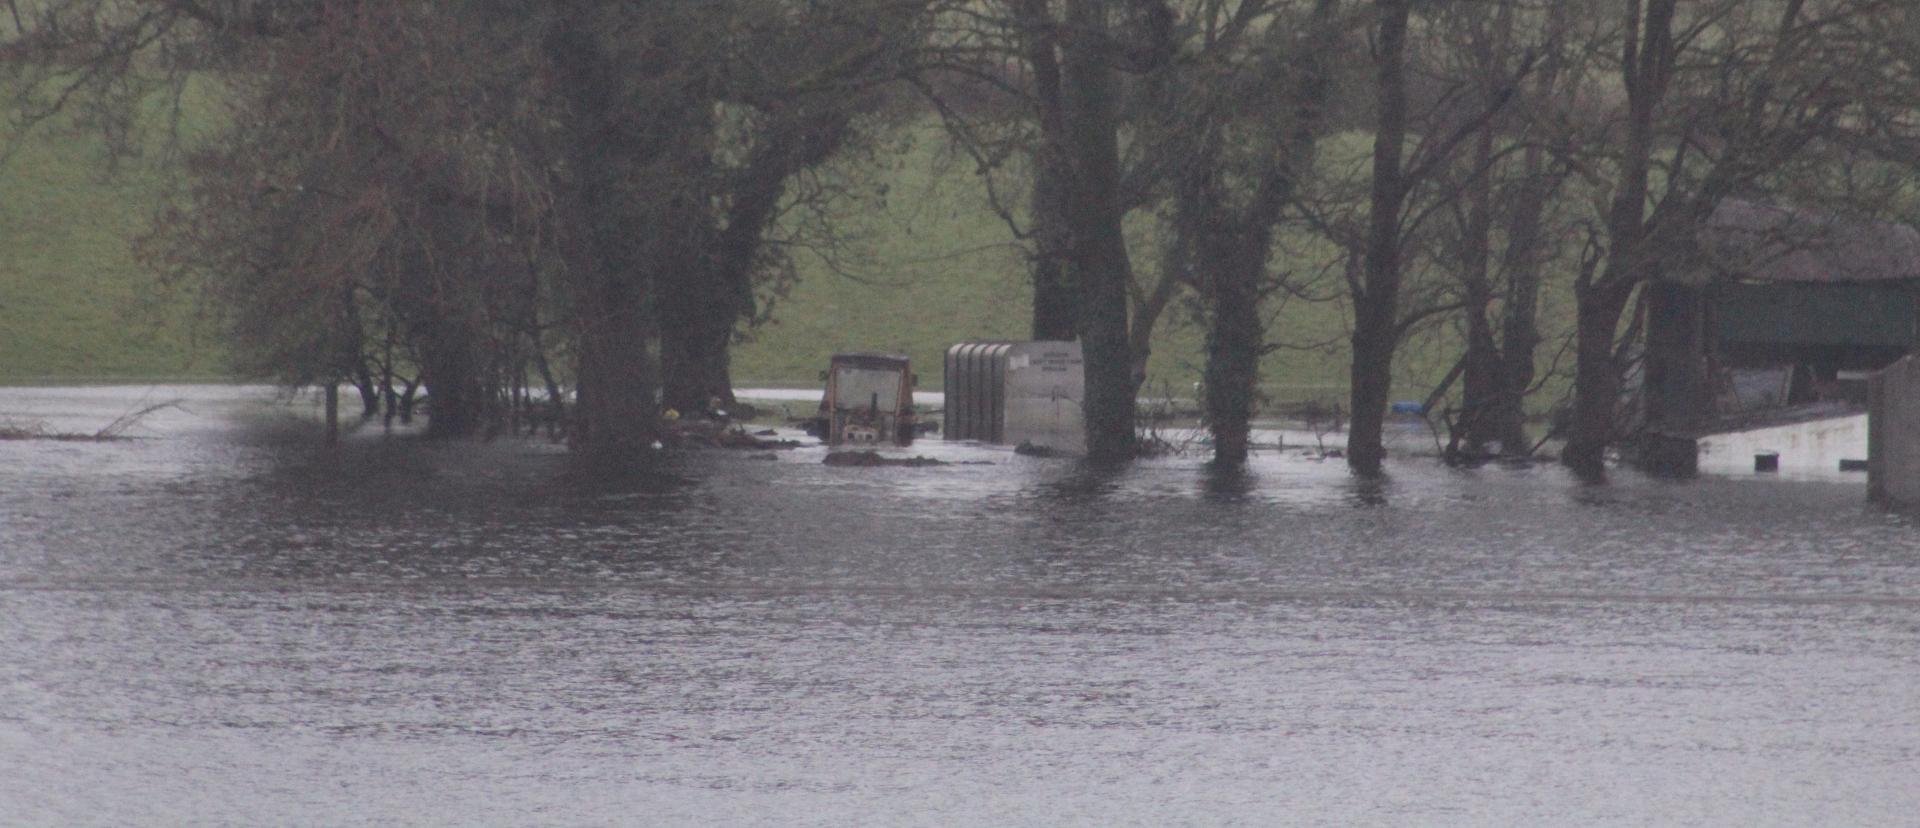 Photo of Sub Aqua team assist at flooding